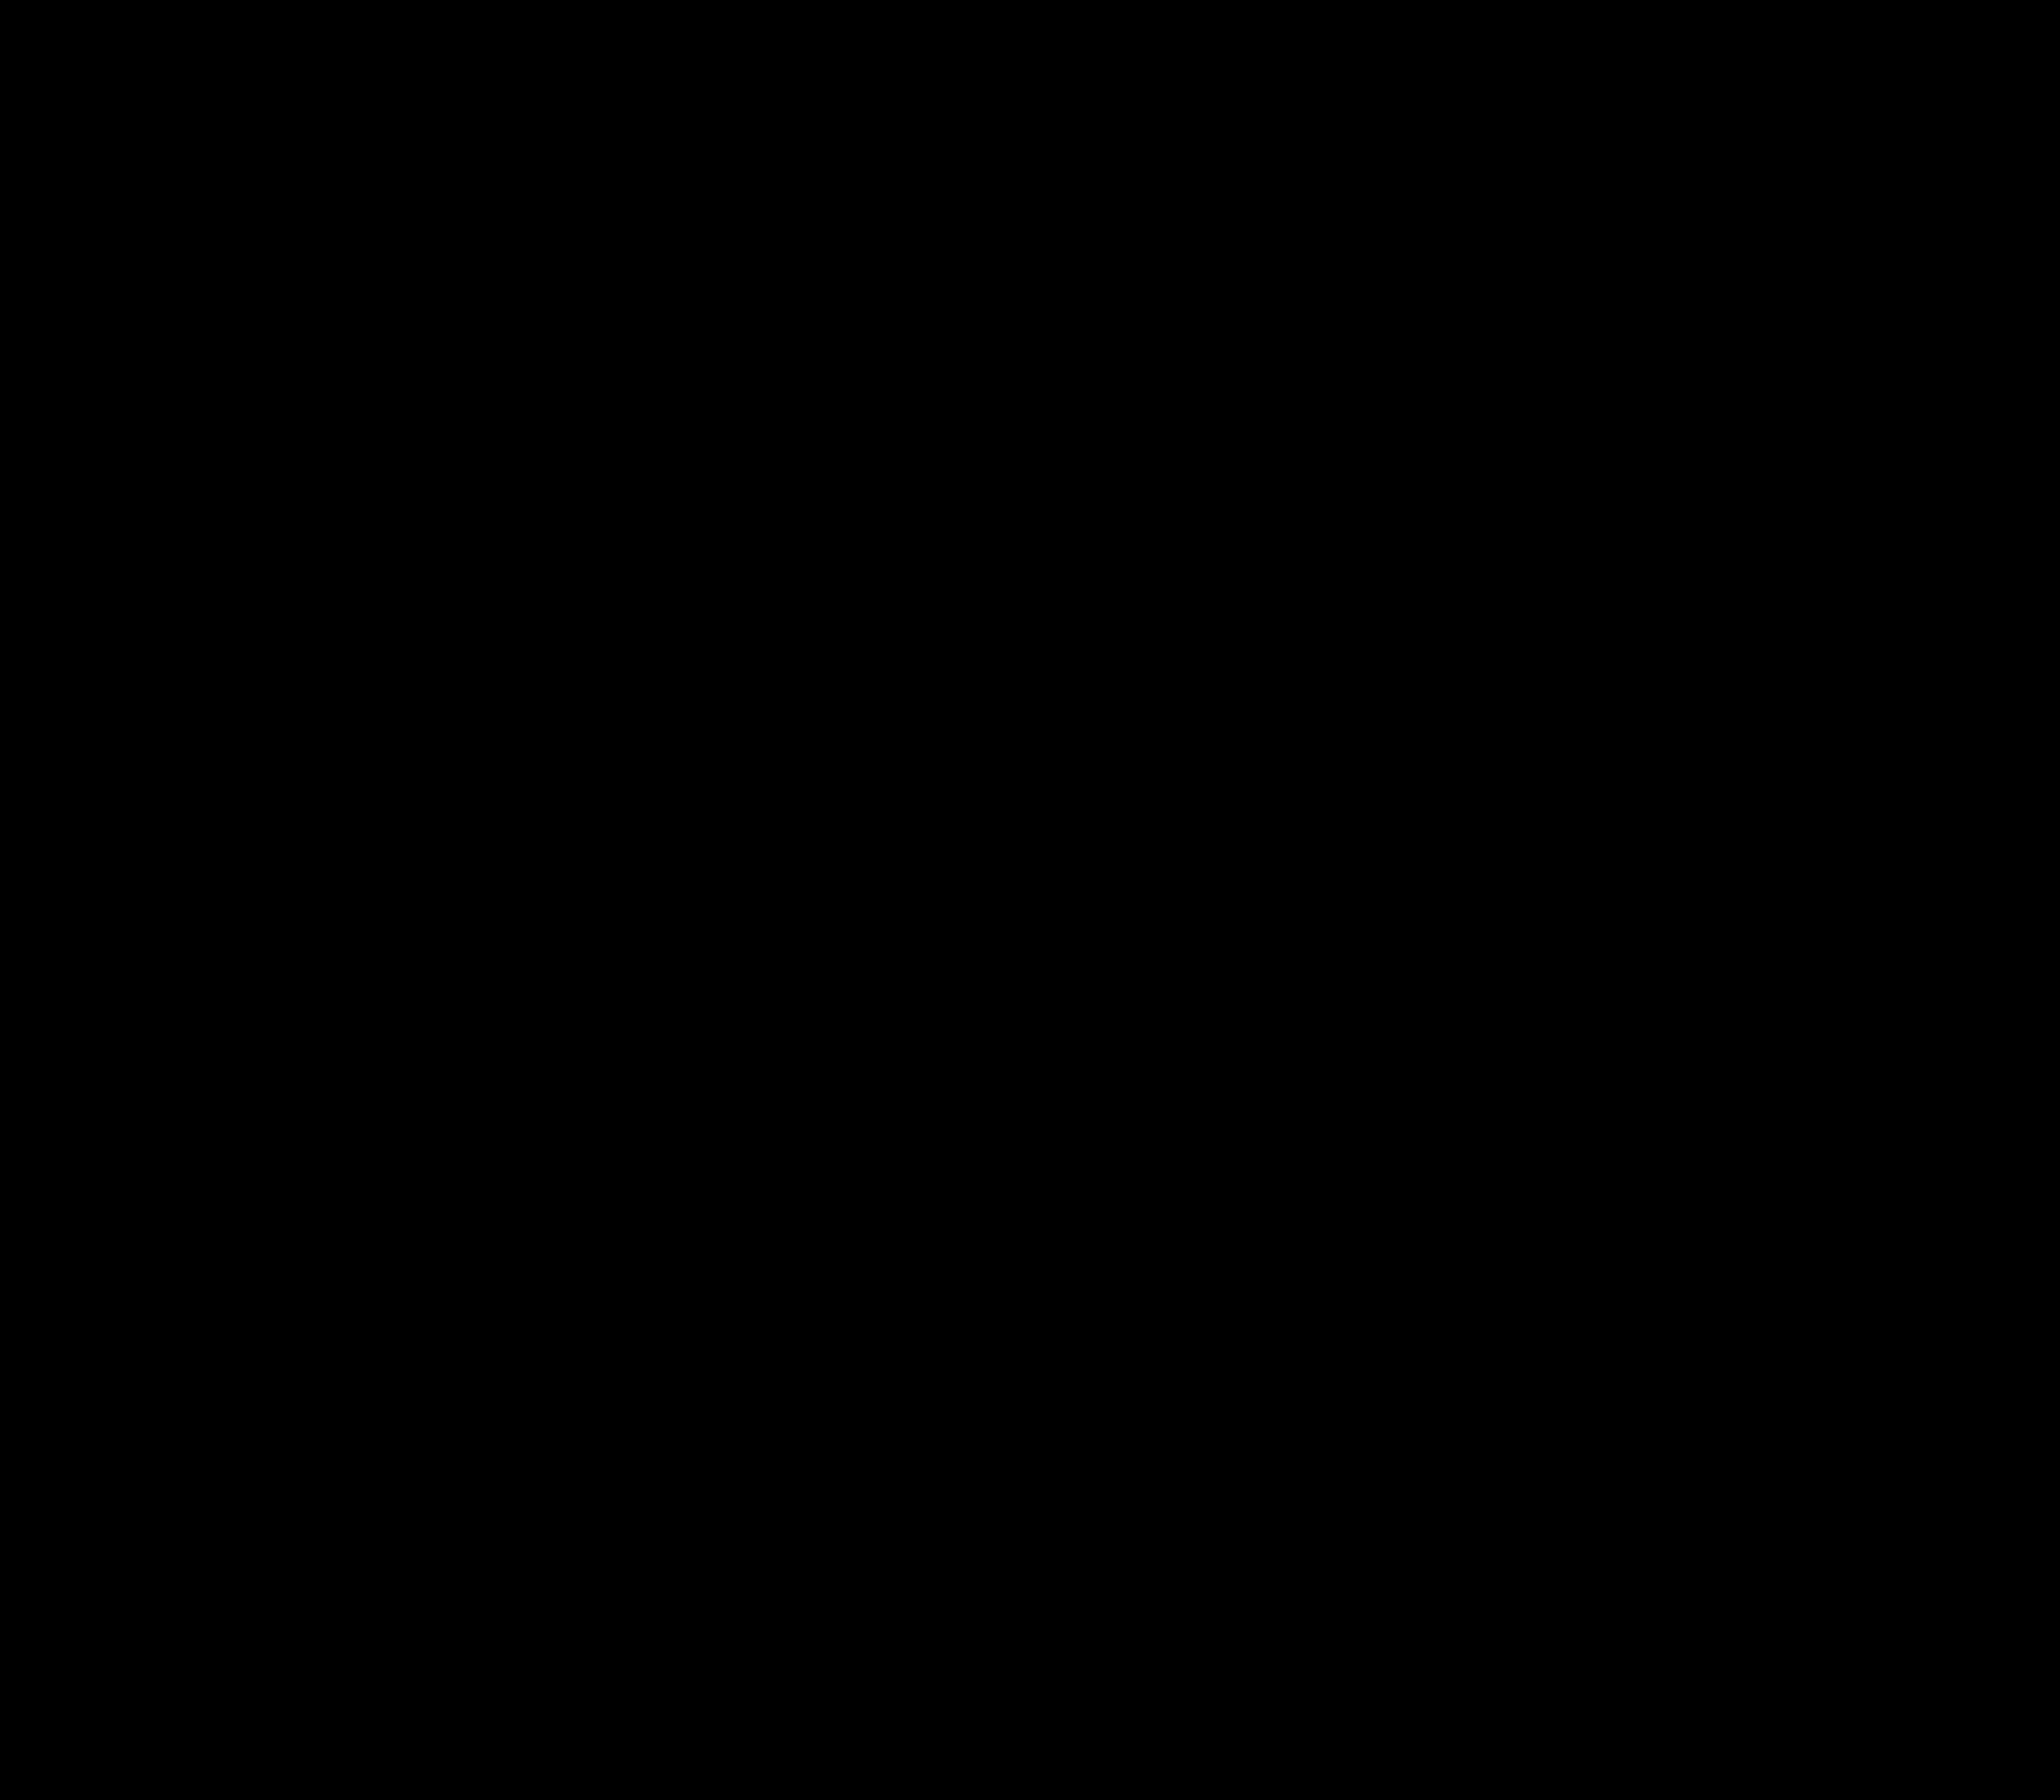 2383x2089 Clipart